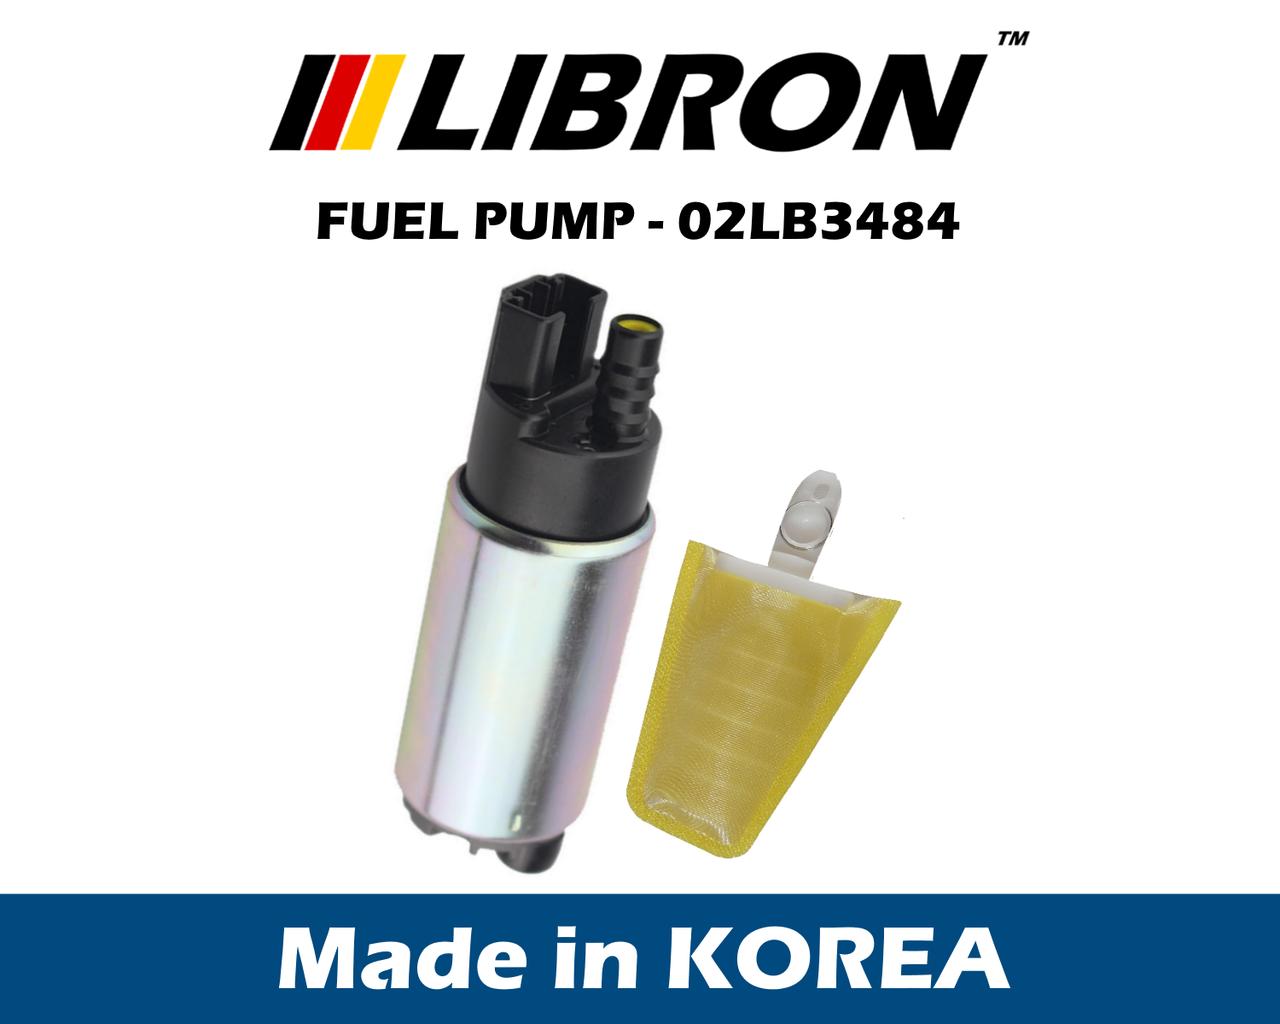 Топливный насос LIBRON 02LB3484 - Хонда Акорд Аккорд IV Aerodeck